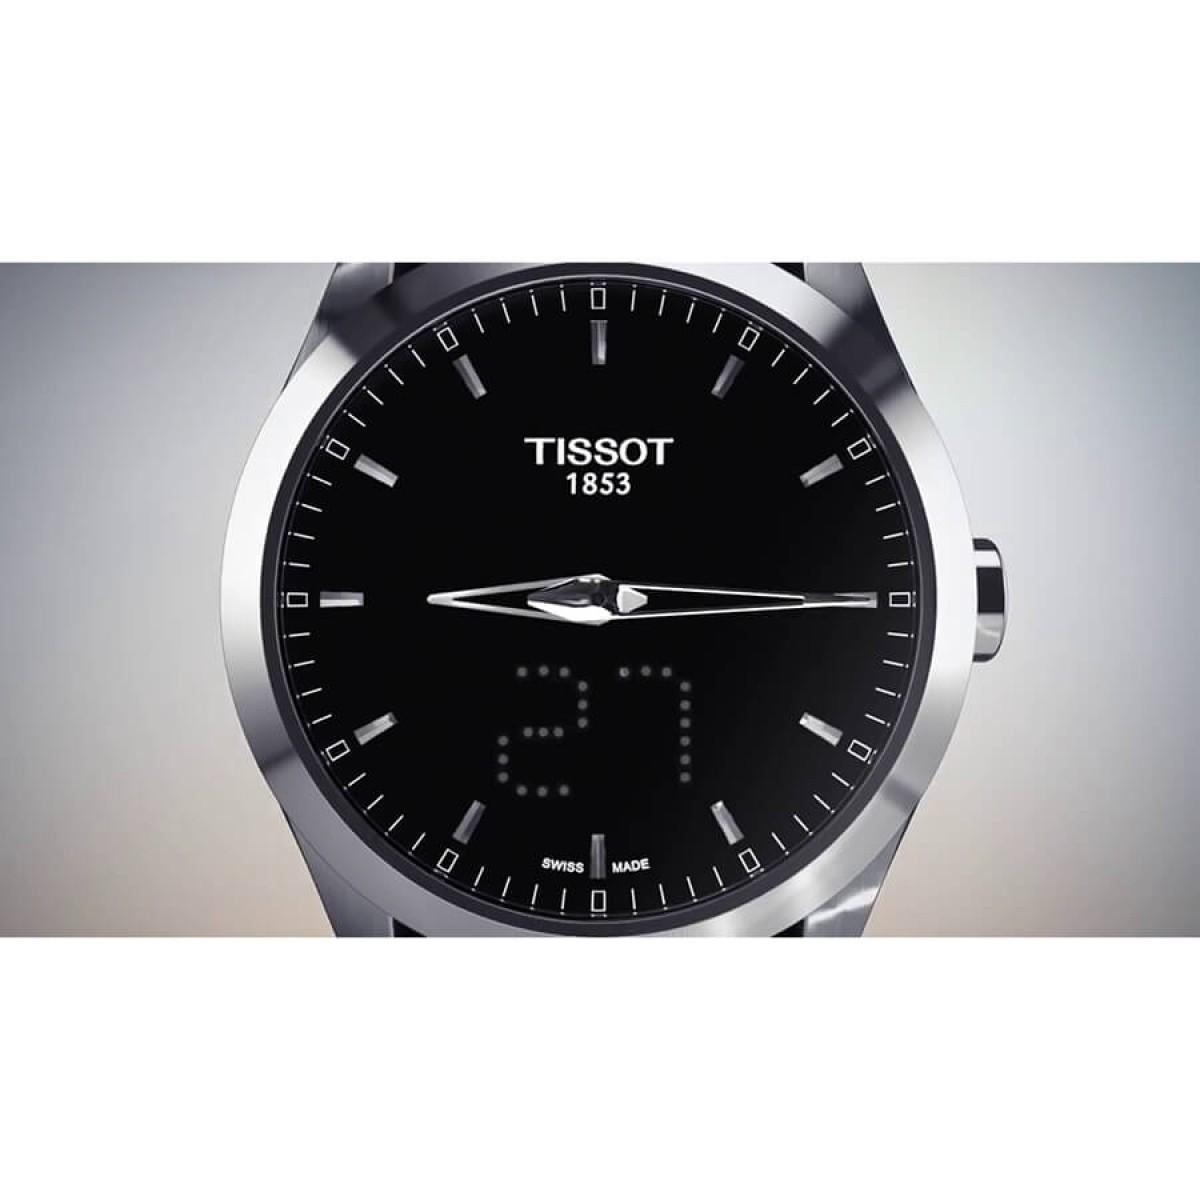 Часовник Tissot T035.446.16.051.00